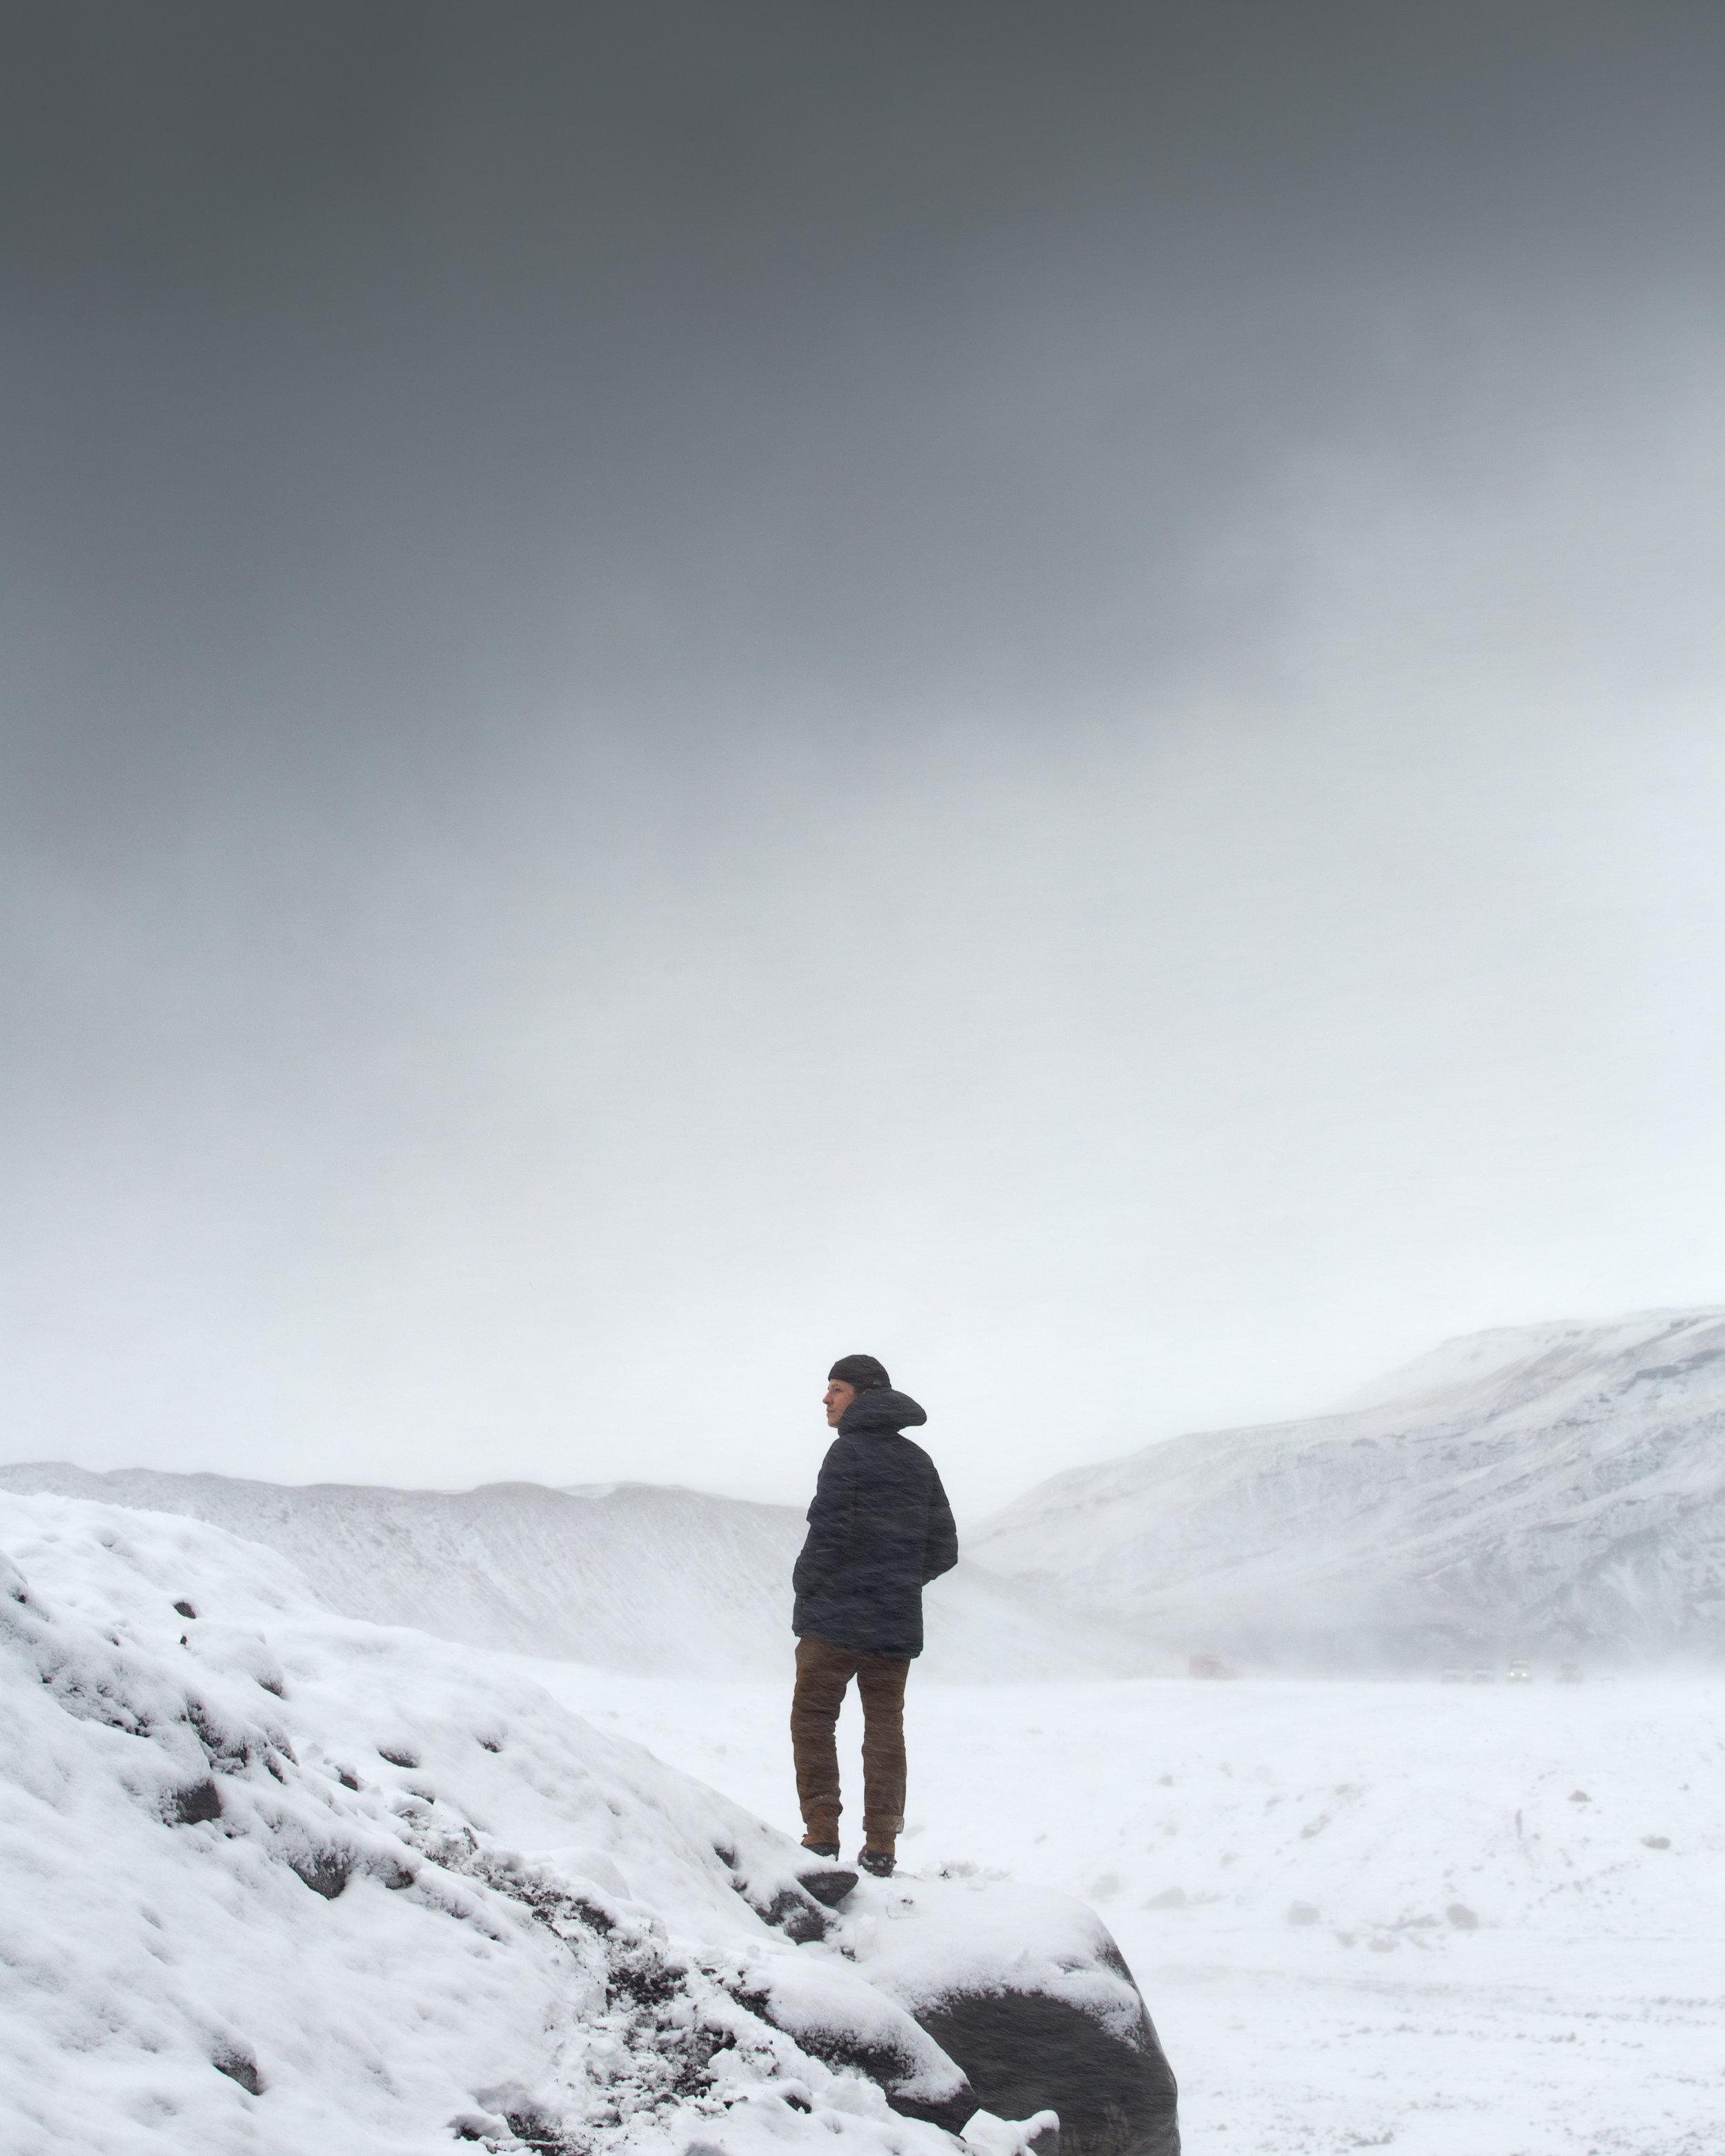 jermiah-schuster-iceland-114.jpg